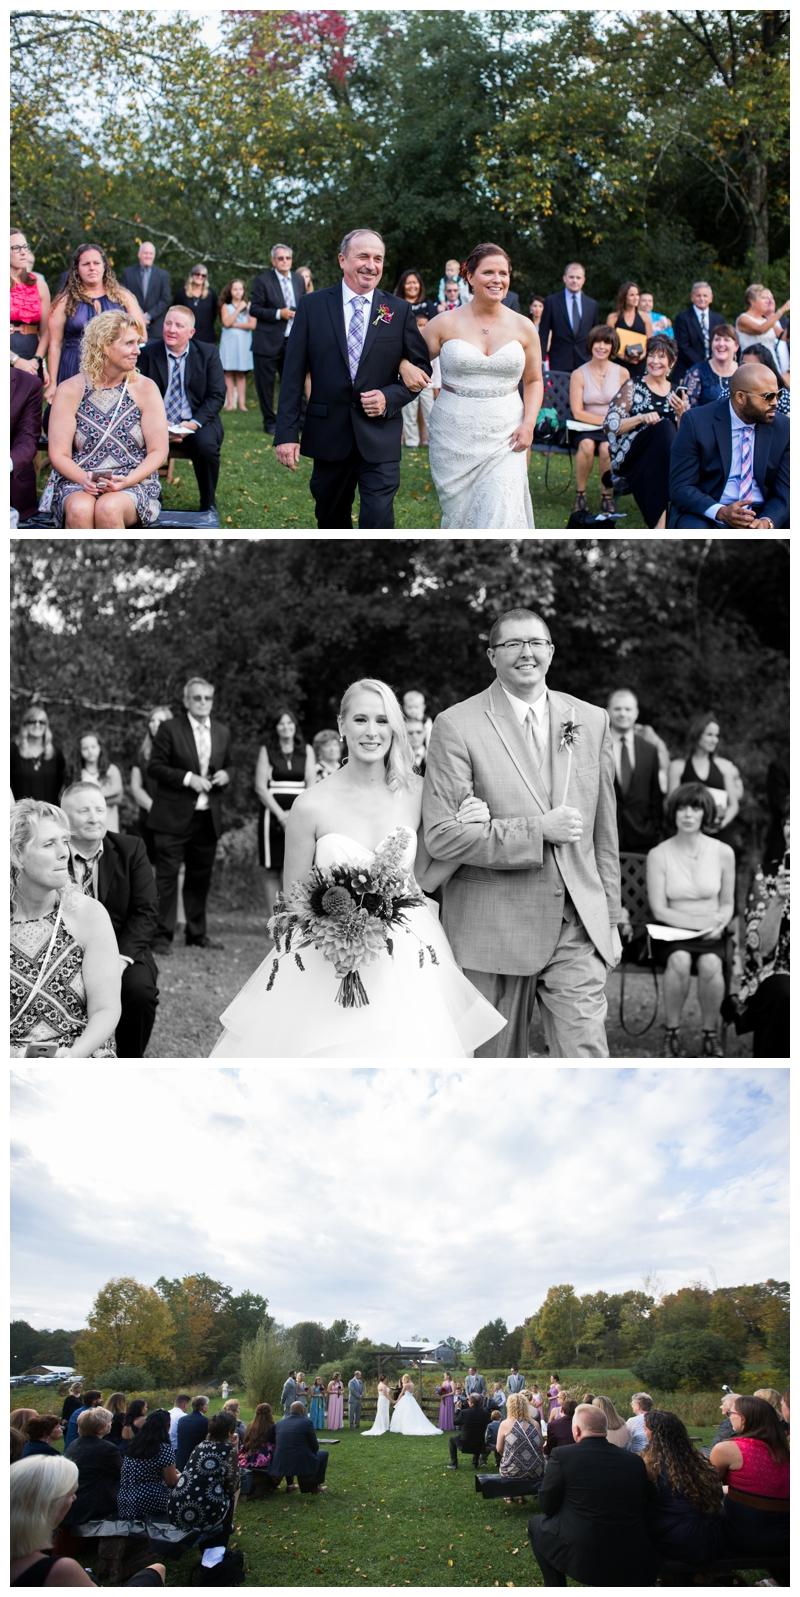 fox-hill-farm-honesdale-wedding-styled-pink-12.jpg